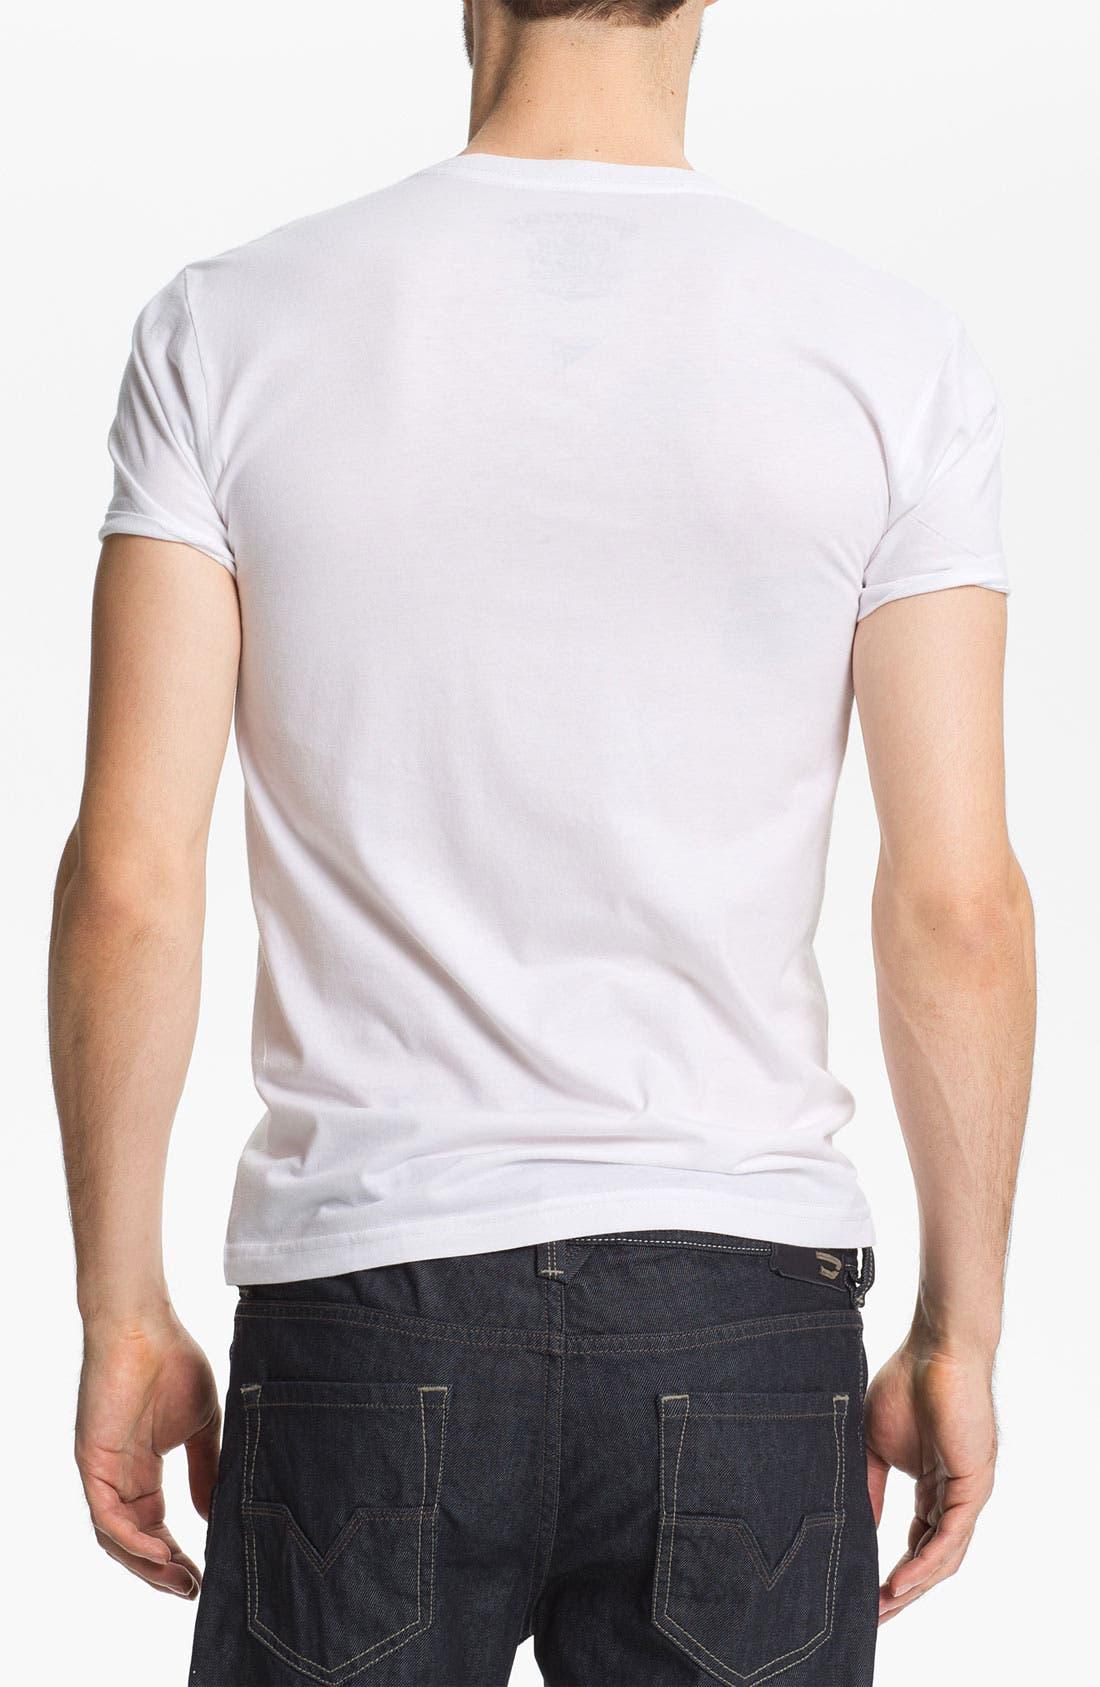 Alternate Image 2  - Bowery Supply 'Polaroid Girl' Graphic V-Neck T-Shirt